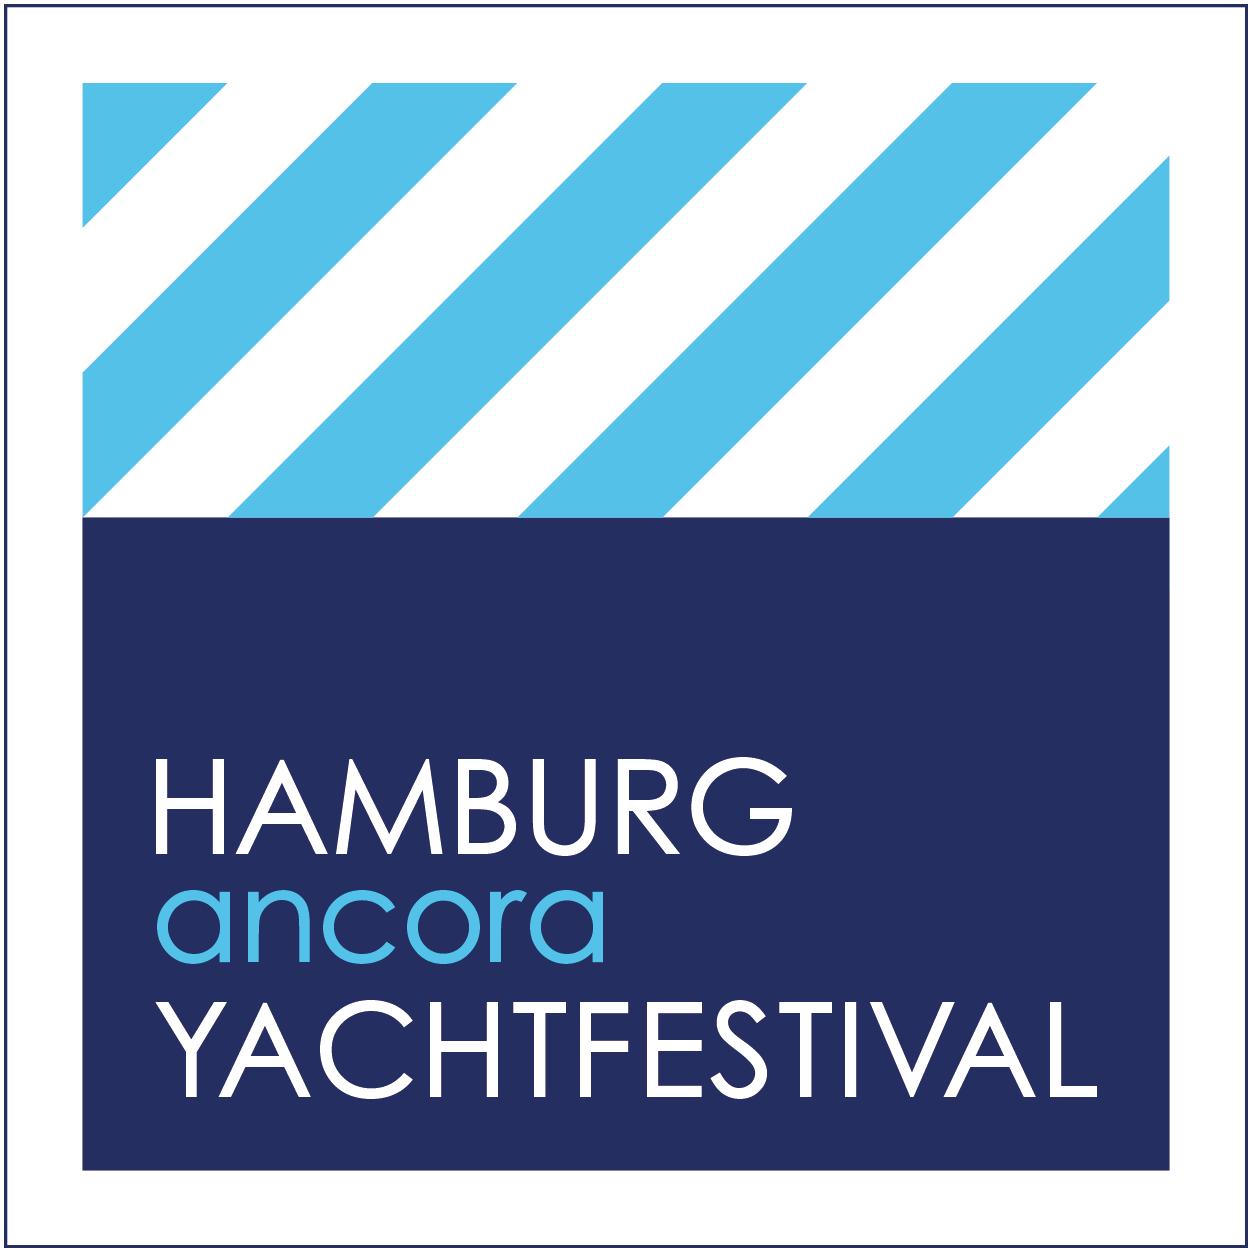 Hamburg Ancora Yachtfestival-Logo